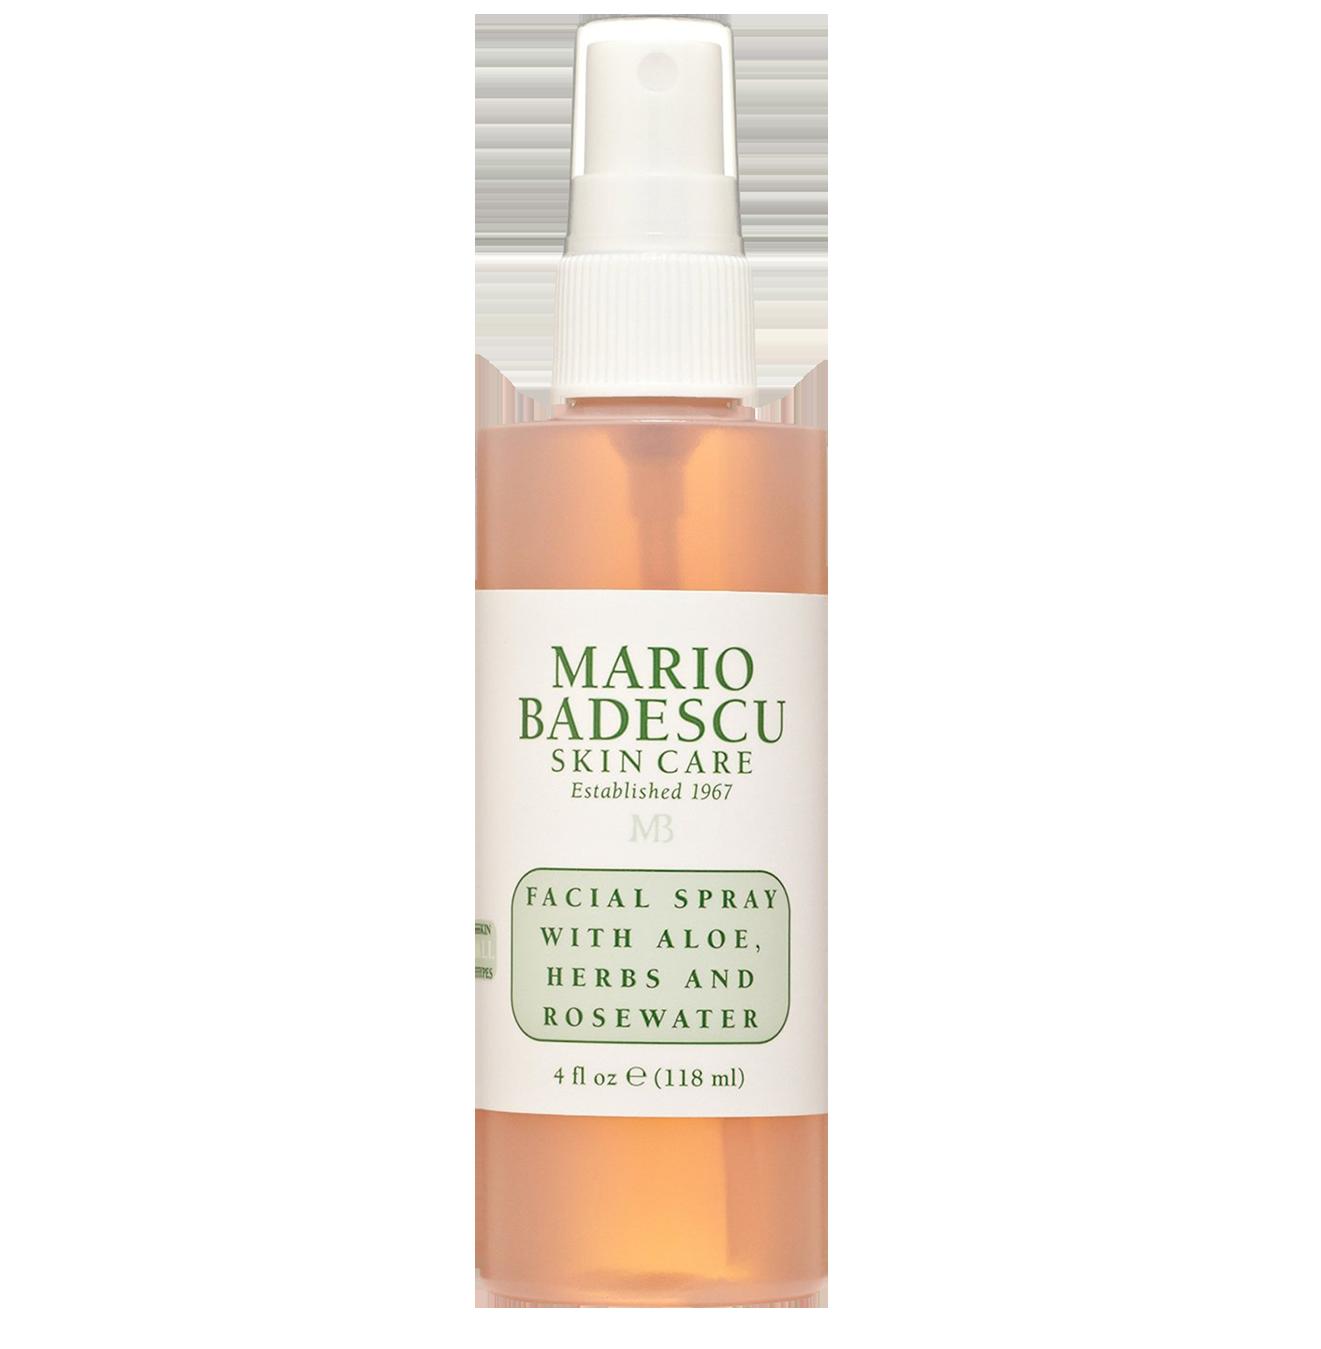 Mario Badescu Facial Spray - This gives you that glow and it smells soooo good!